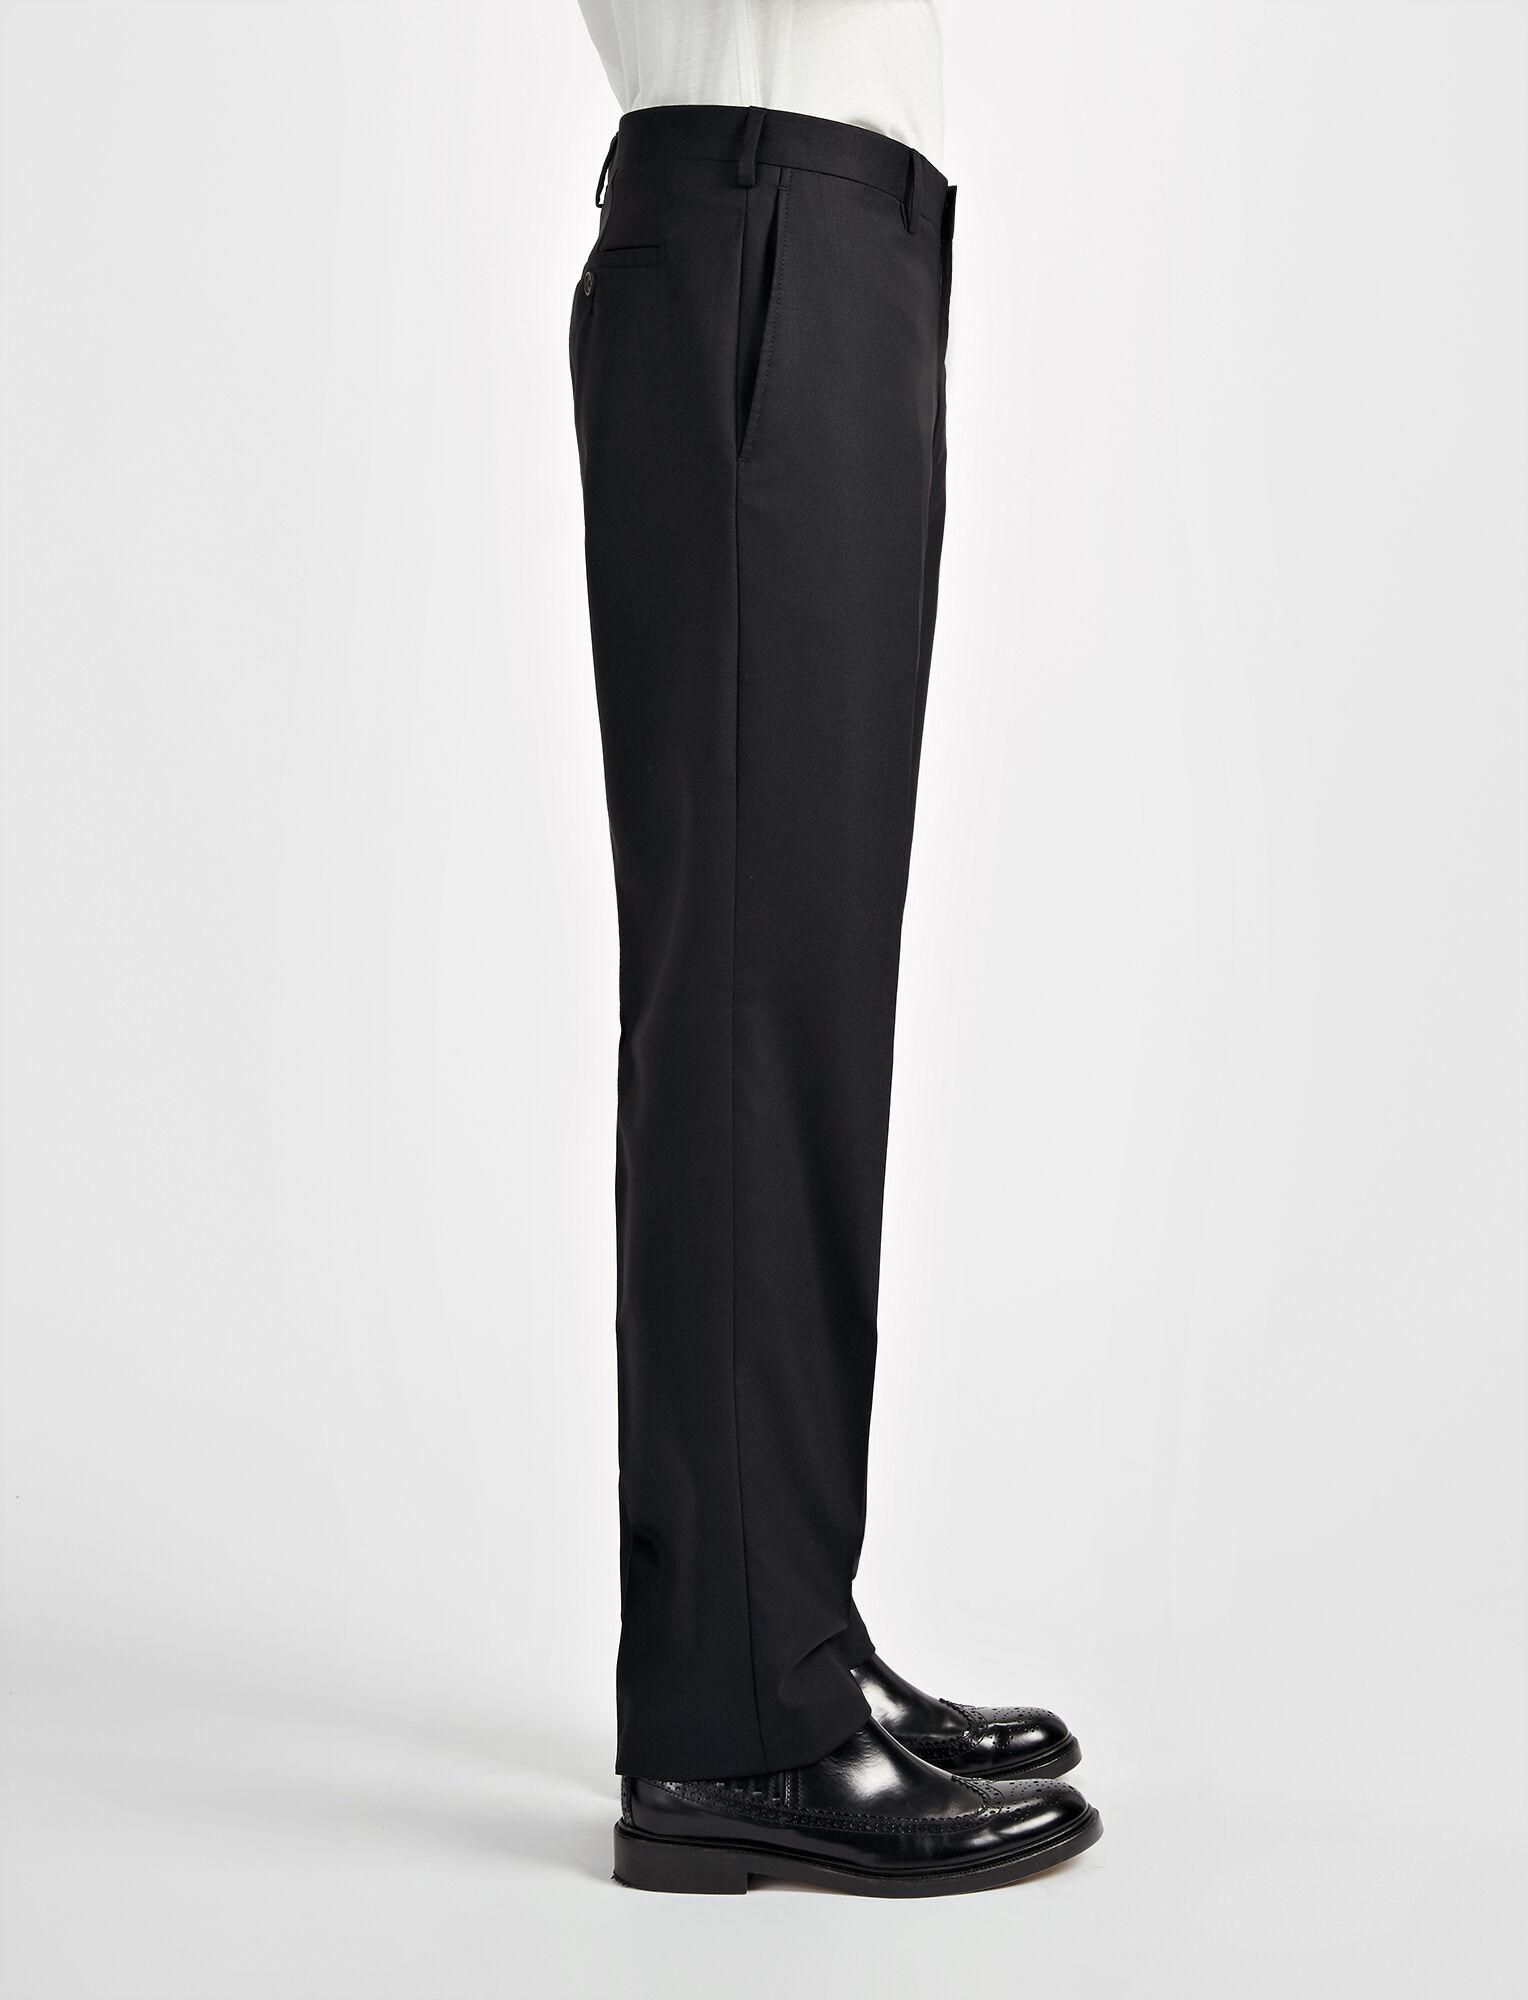 Joseph, Tropical Wool Darwin Suit Trouser, in BLACK